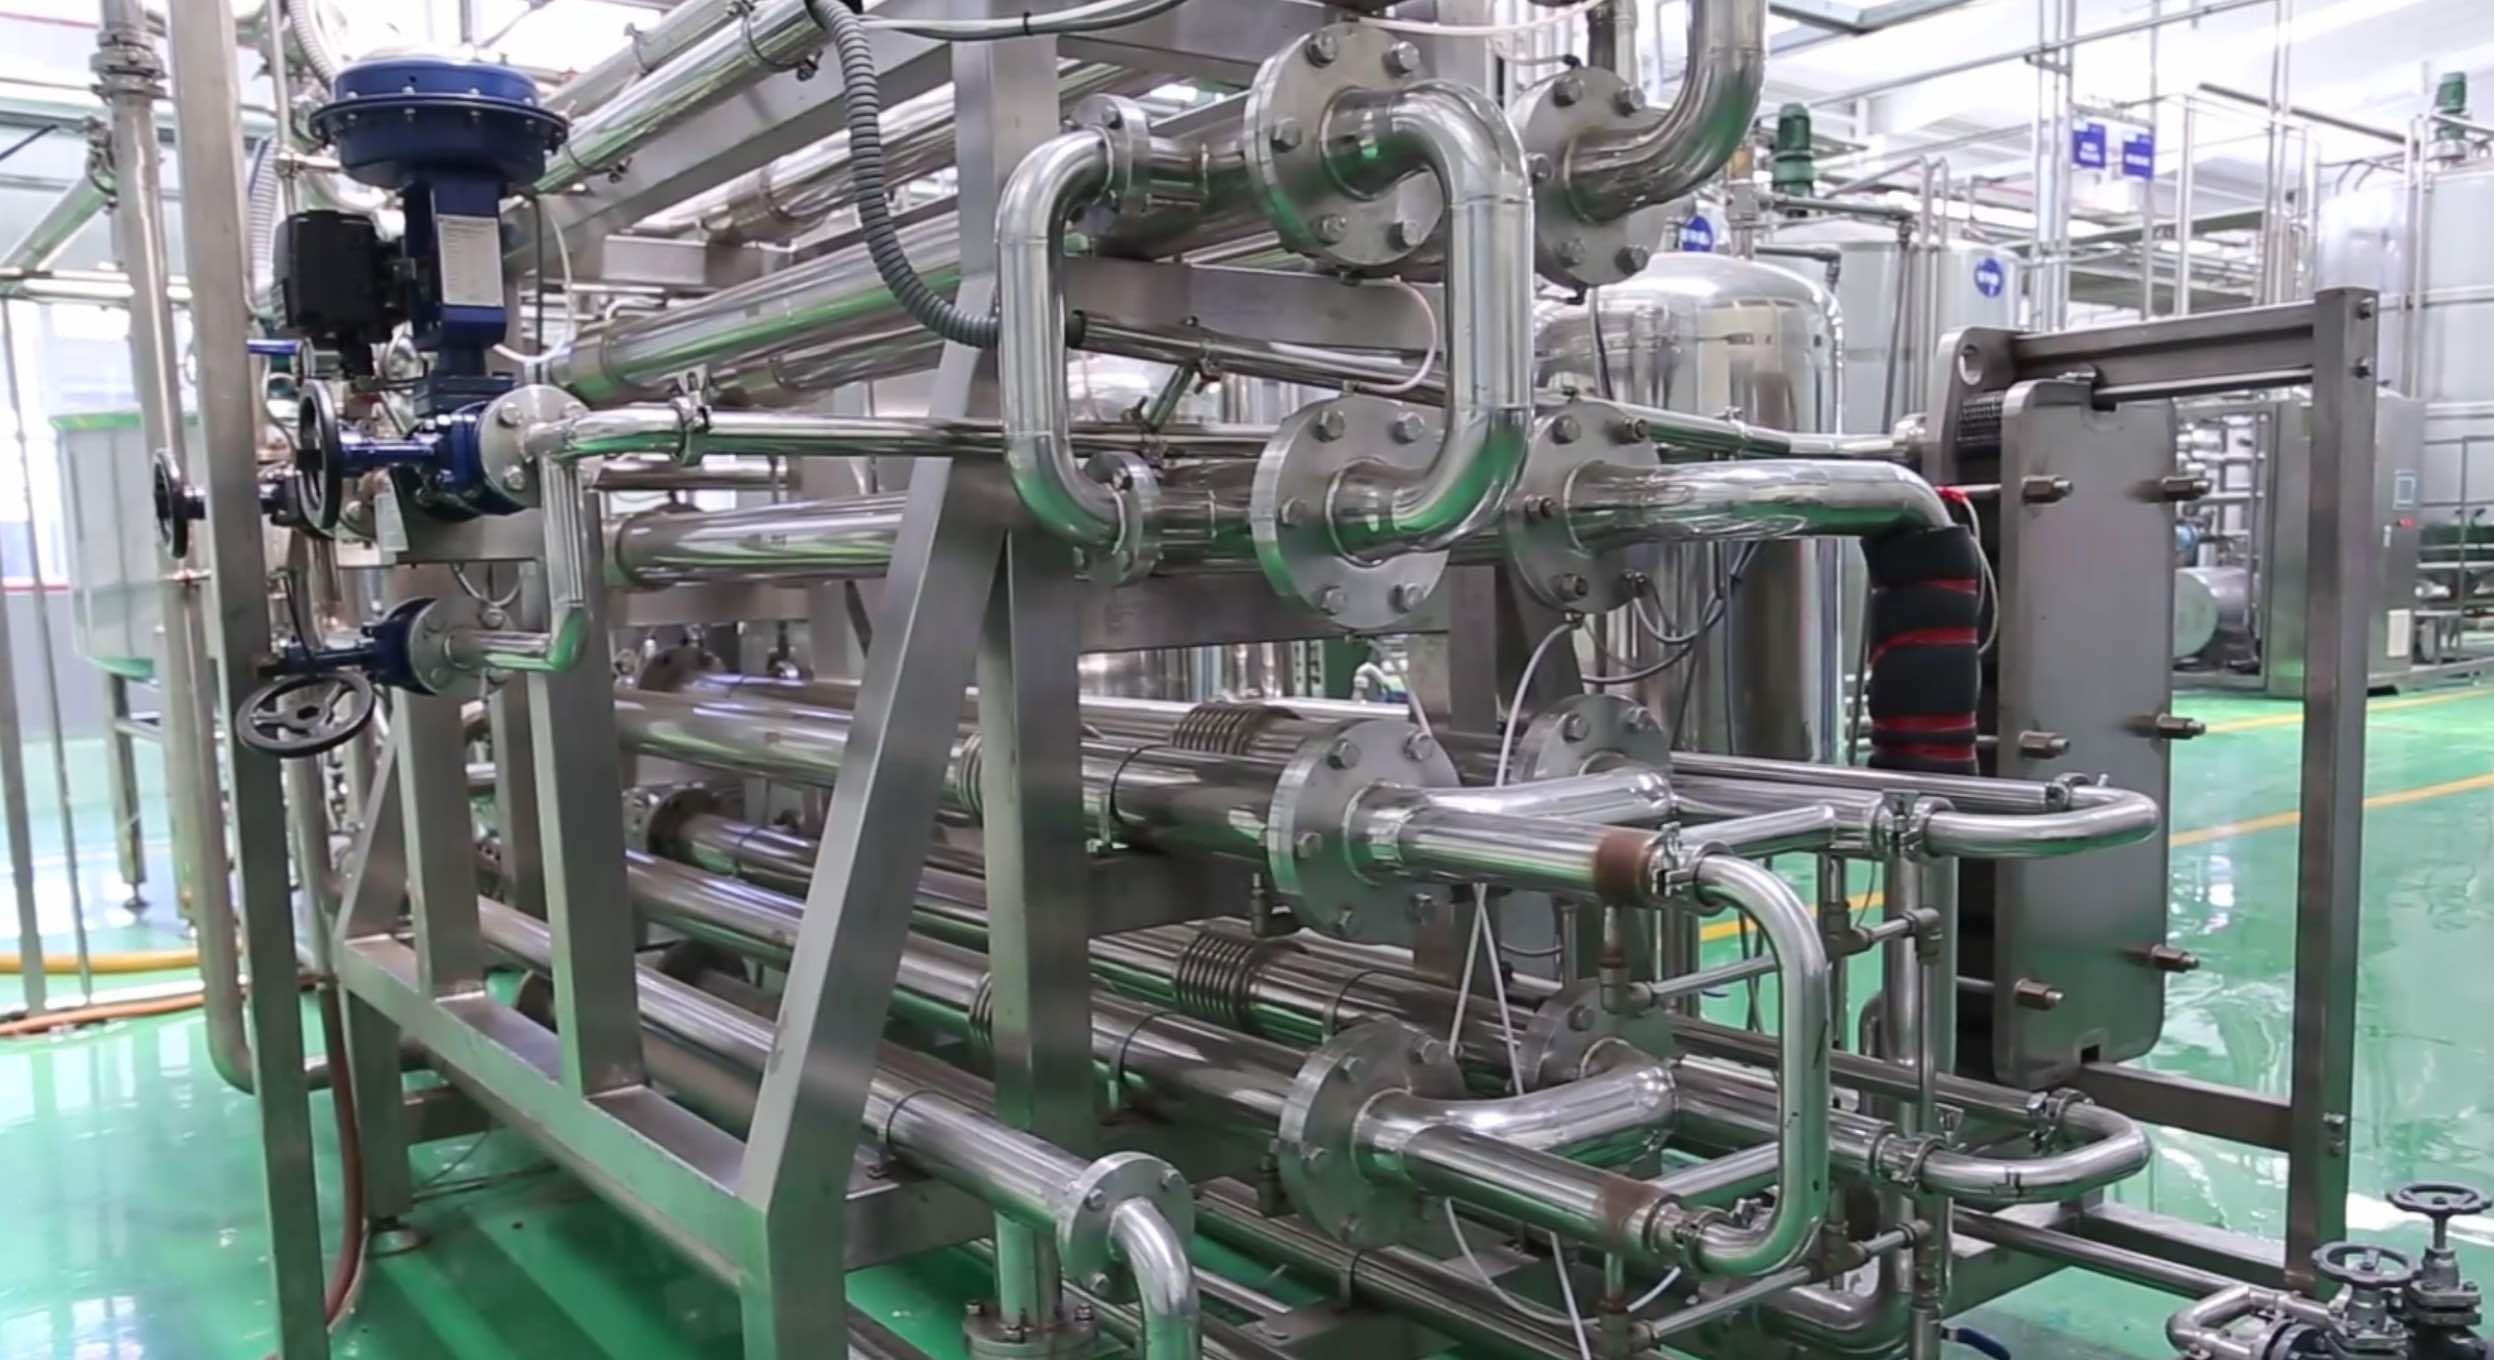 2 – 5 T / Hour Capacity UHT Milk Processing Line High Temperature Sterilization